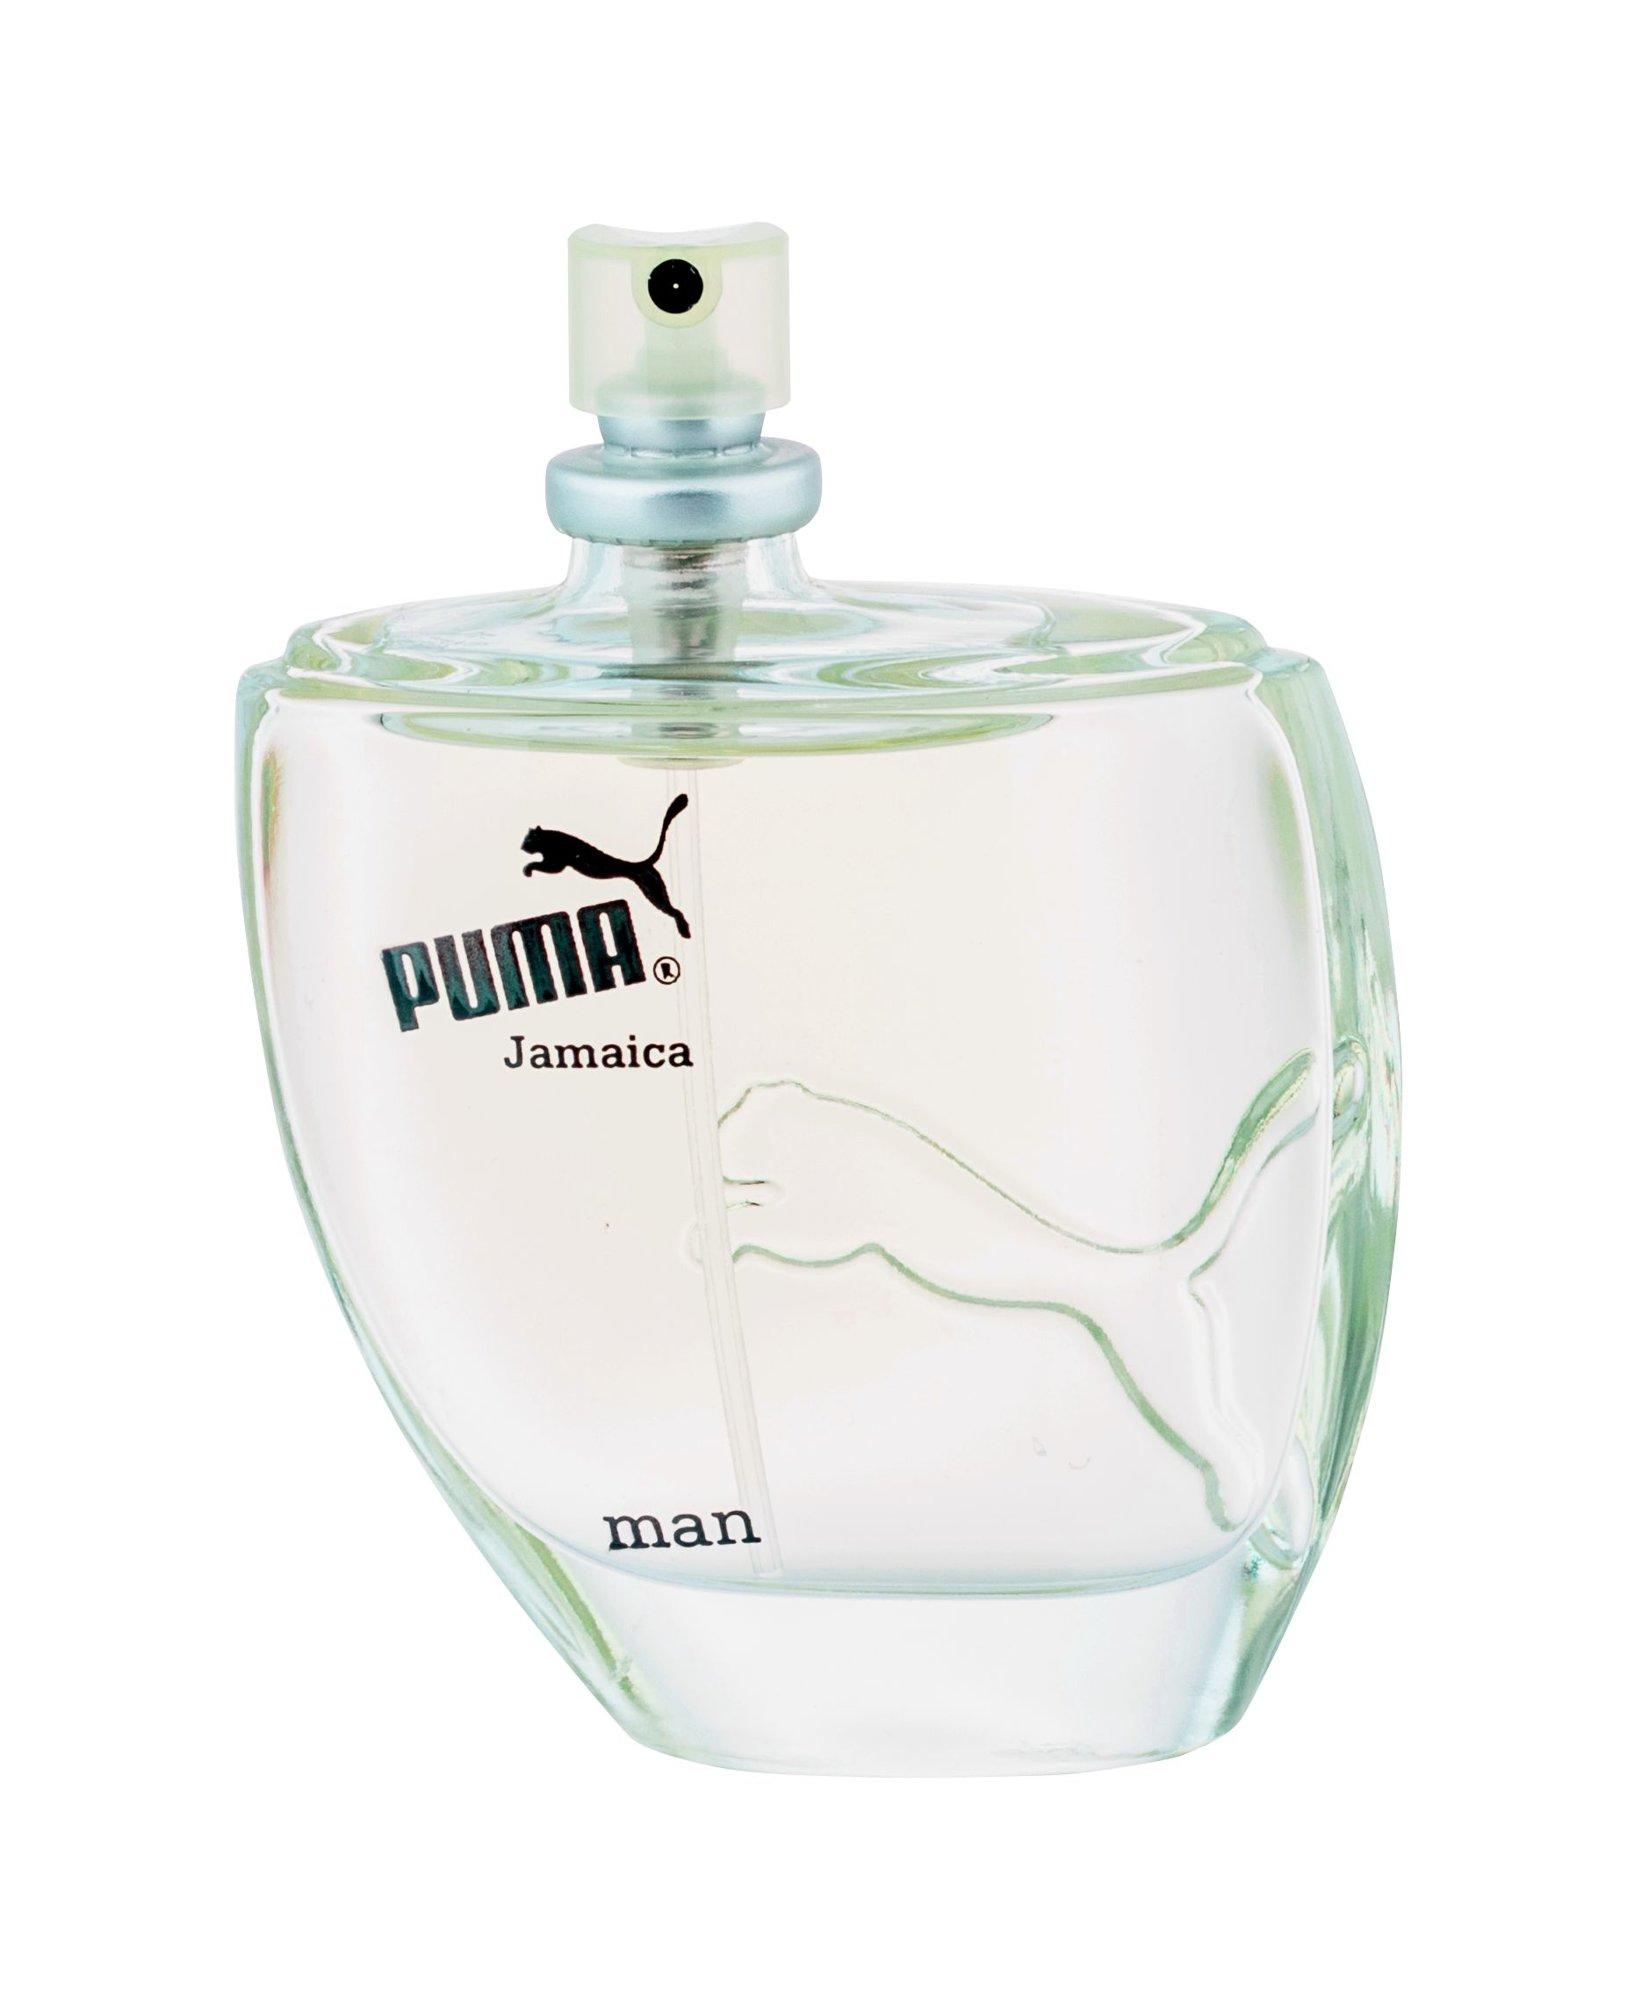 Puma Jamaica Man EDT 50ml